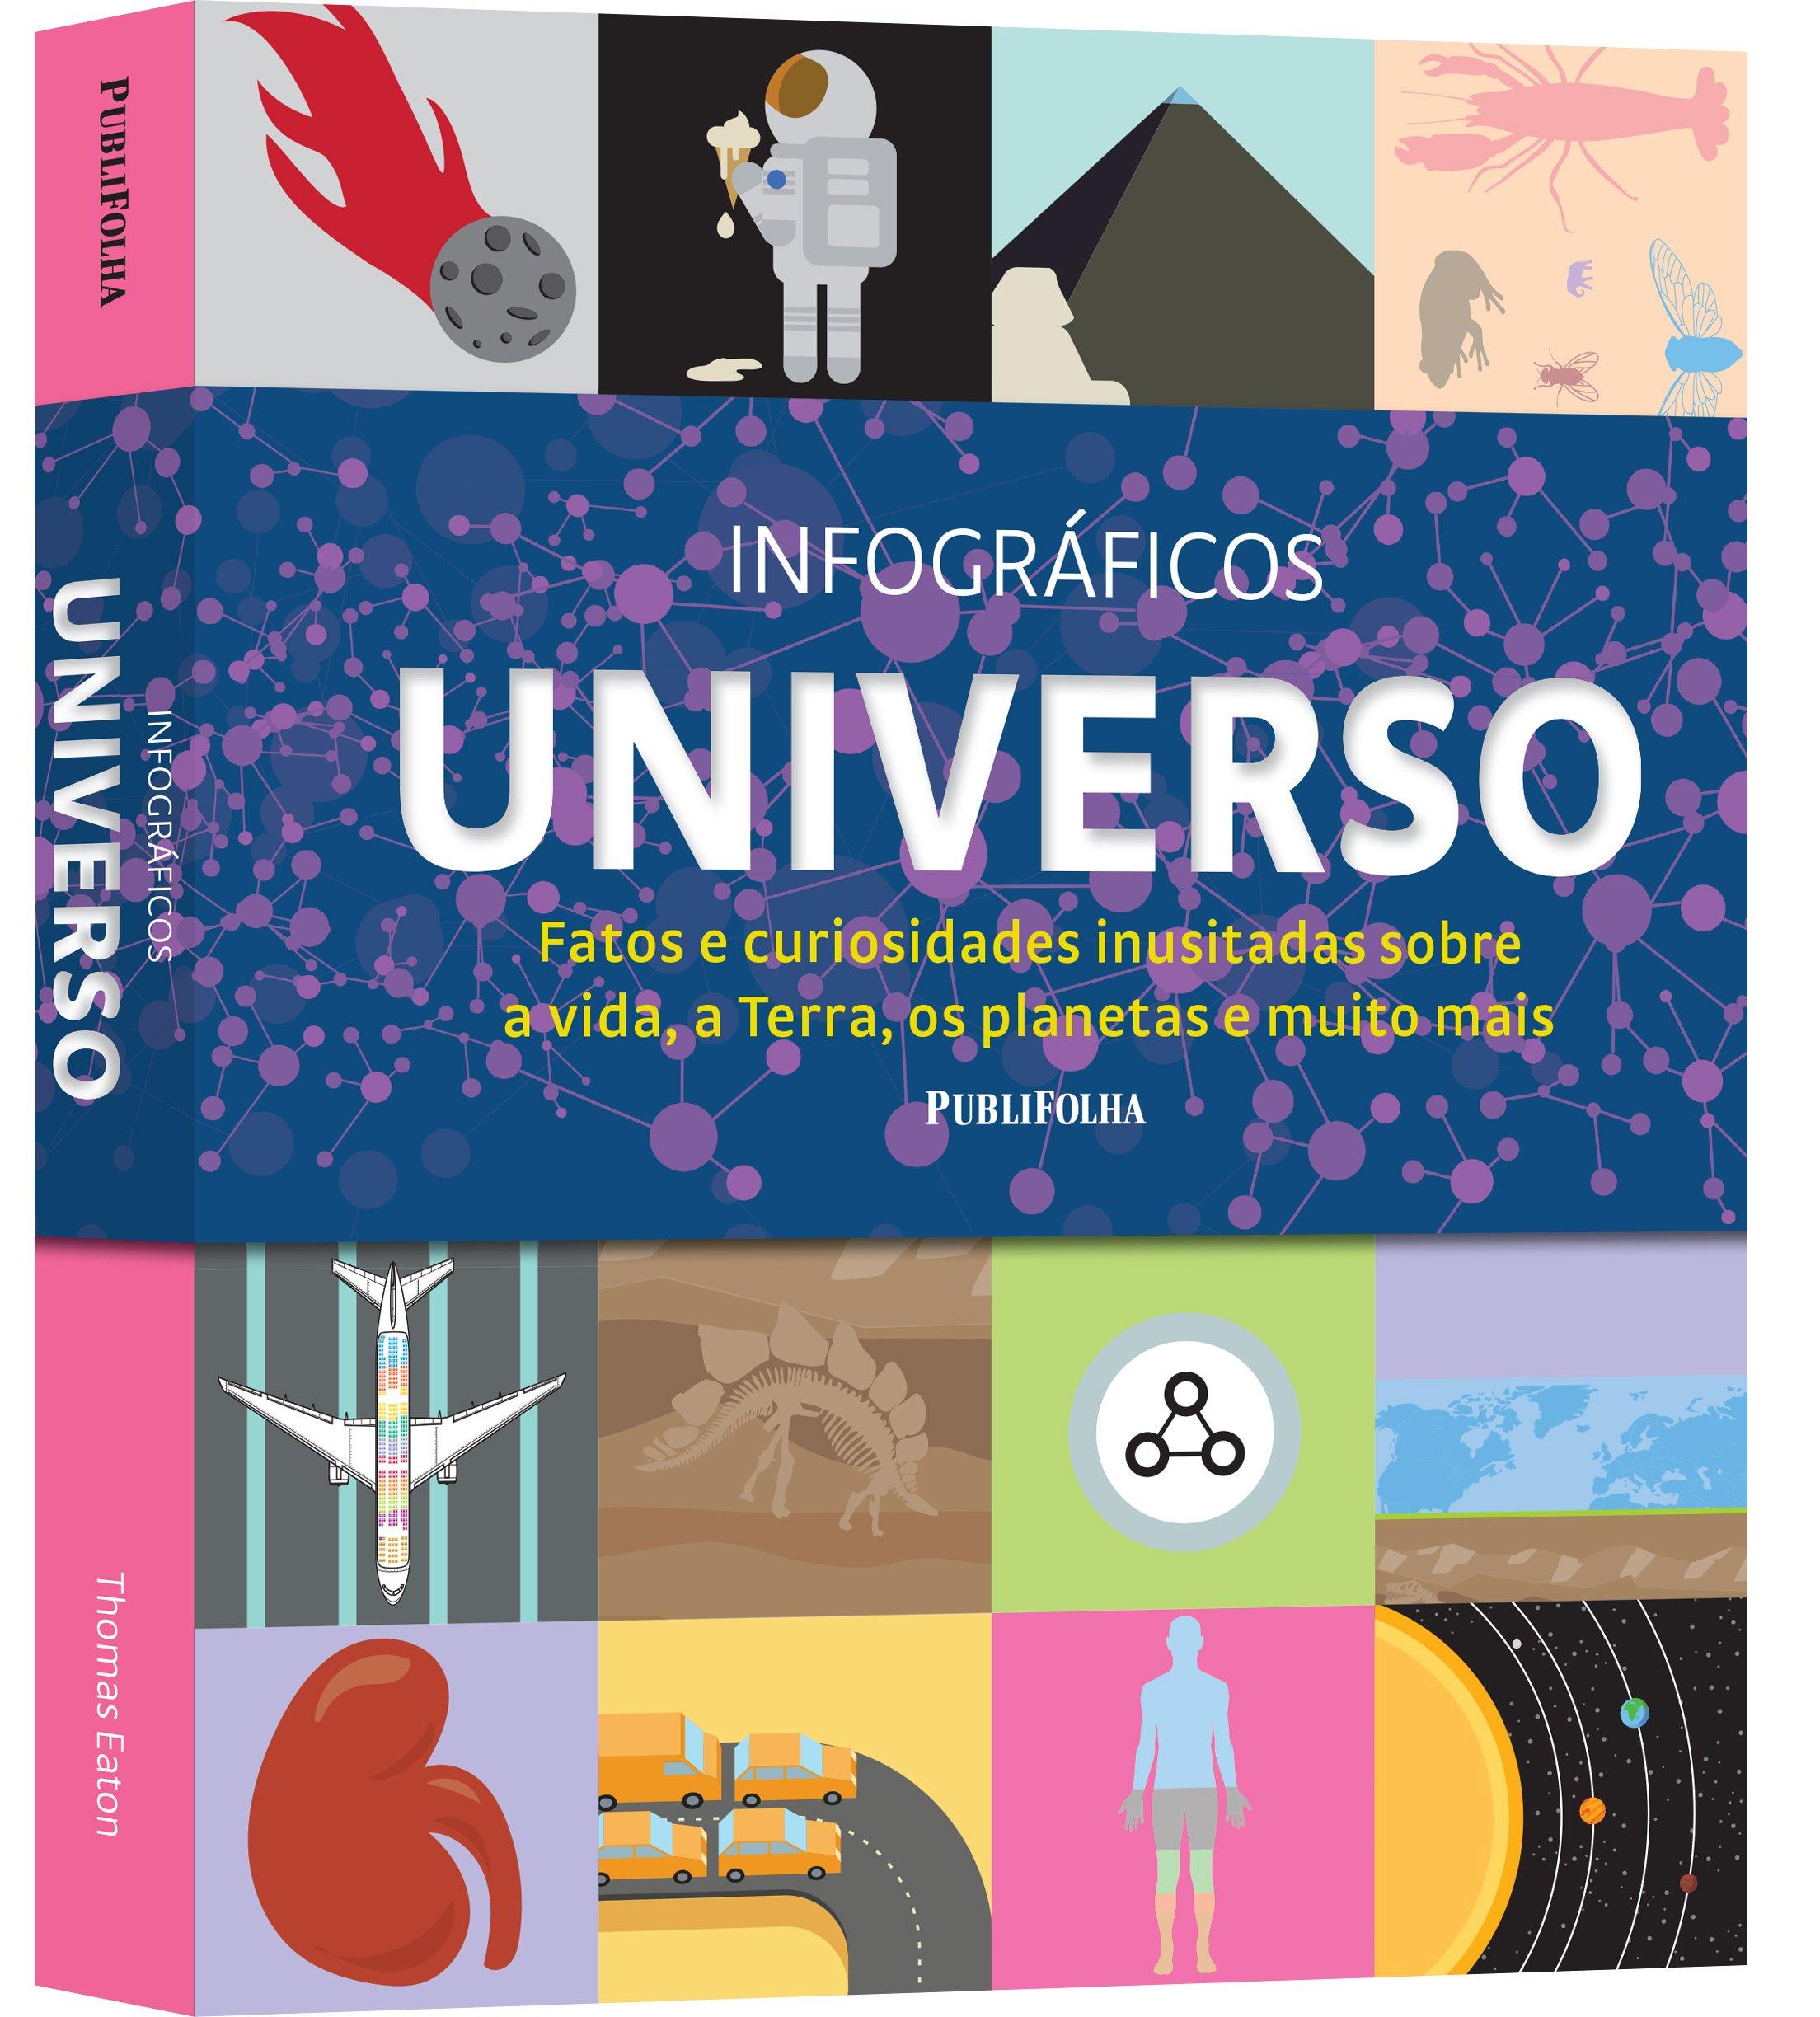 Universo (Em Portuguese do Brasil): Thmas Eaton: 9788568684634: Amazon.com: Books